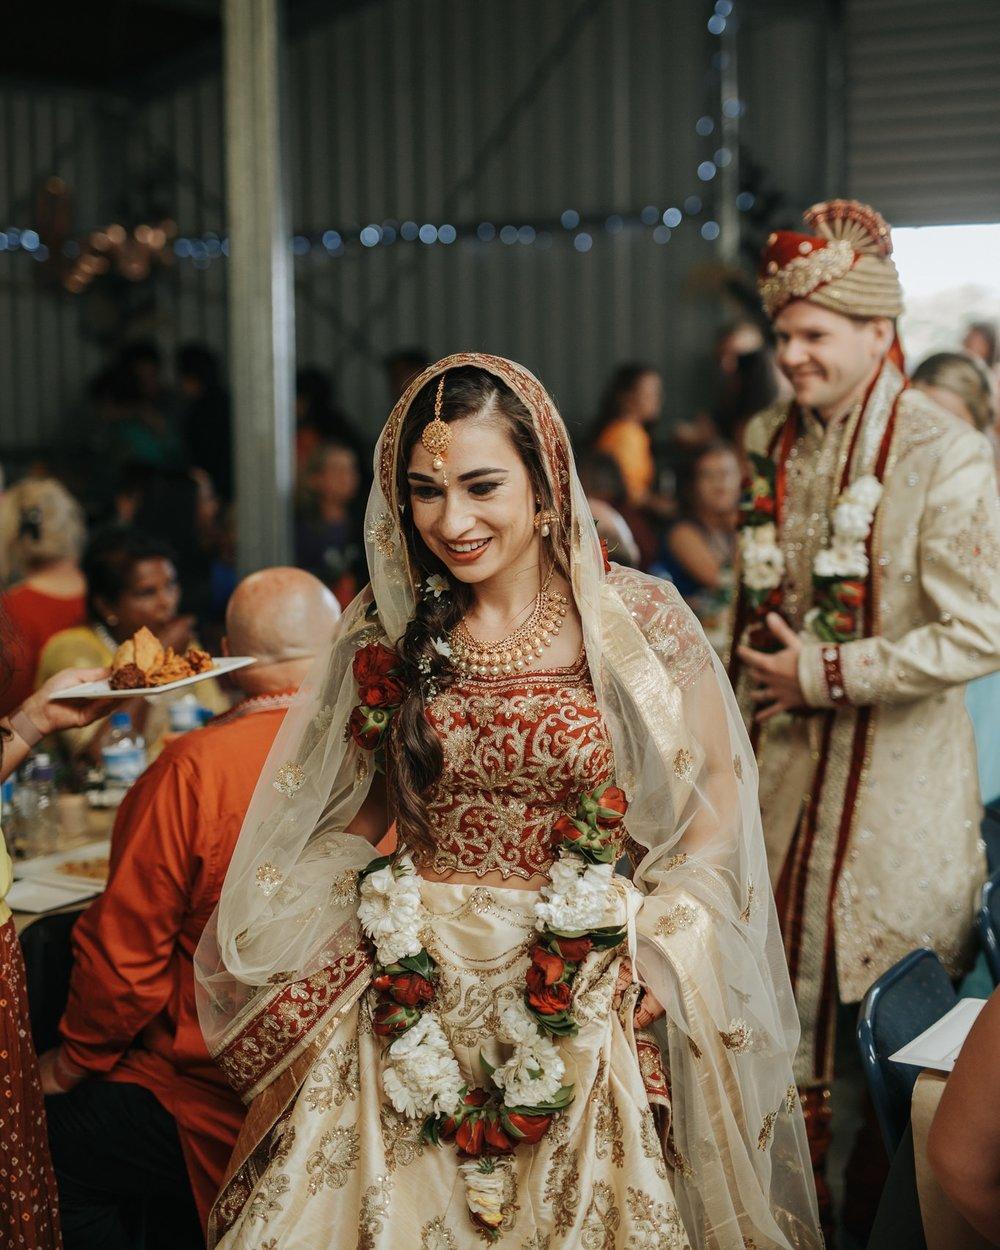 wainui-wedding-blog-aaronsami-169.jpg